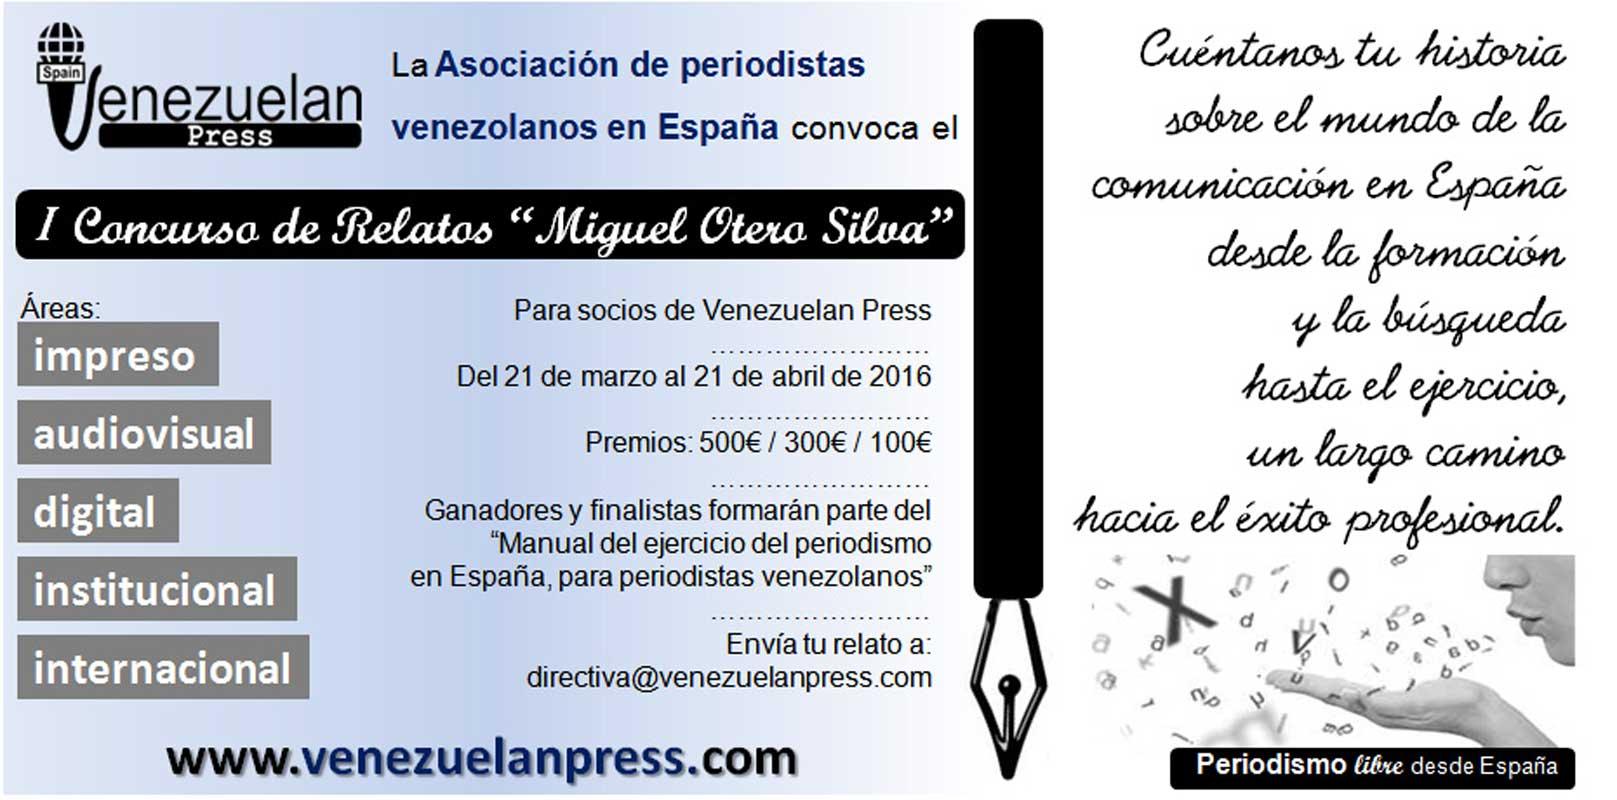 Convocatoria I Concurso relatos Venezuelan Press Miguel Otero Silva